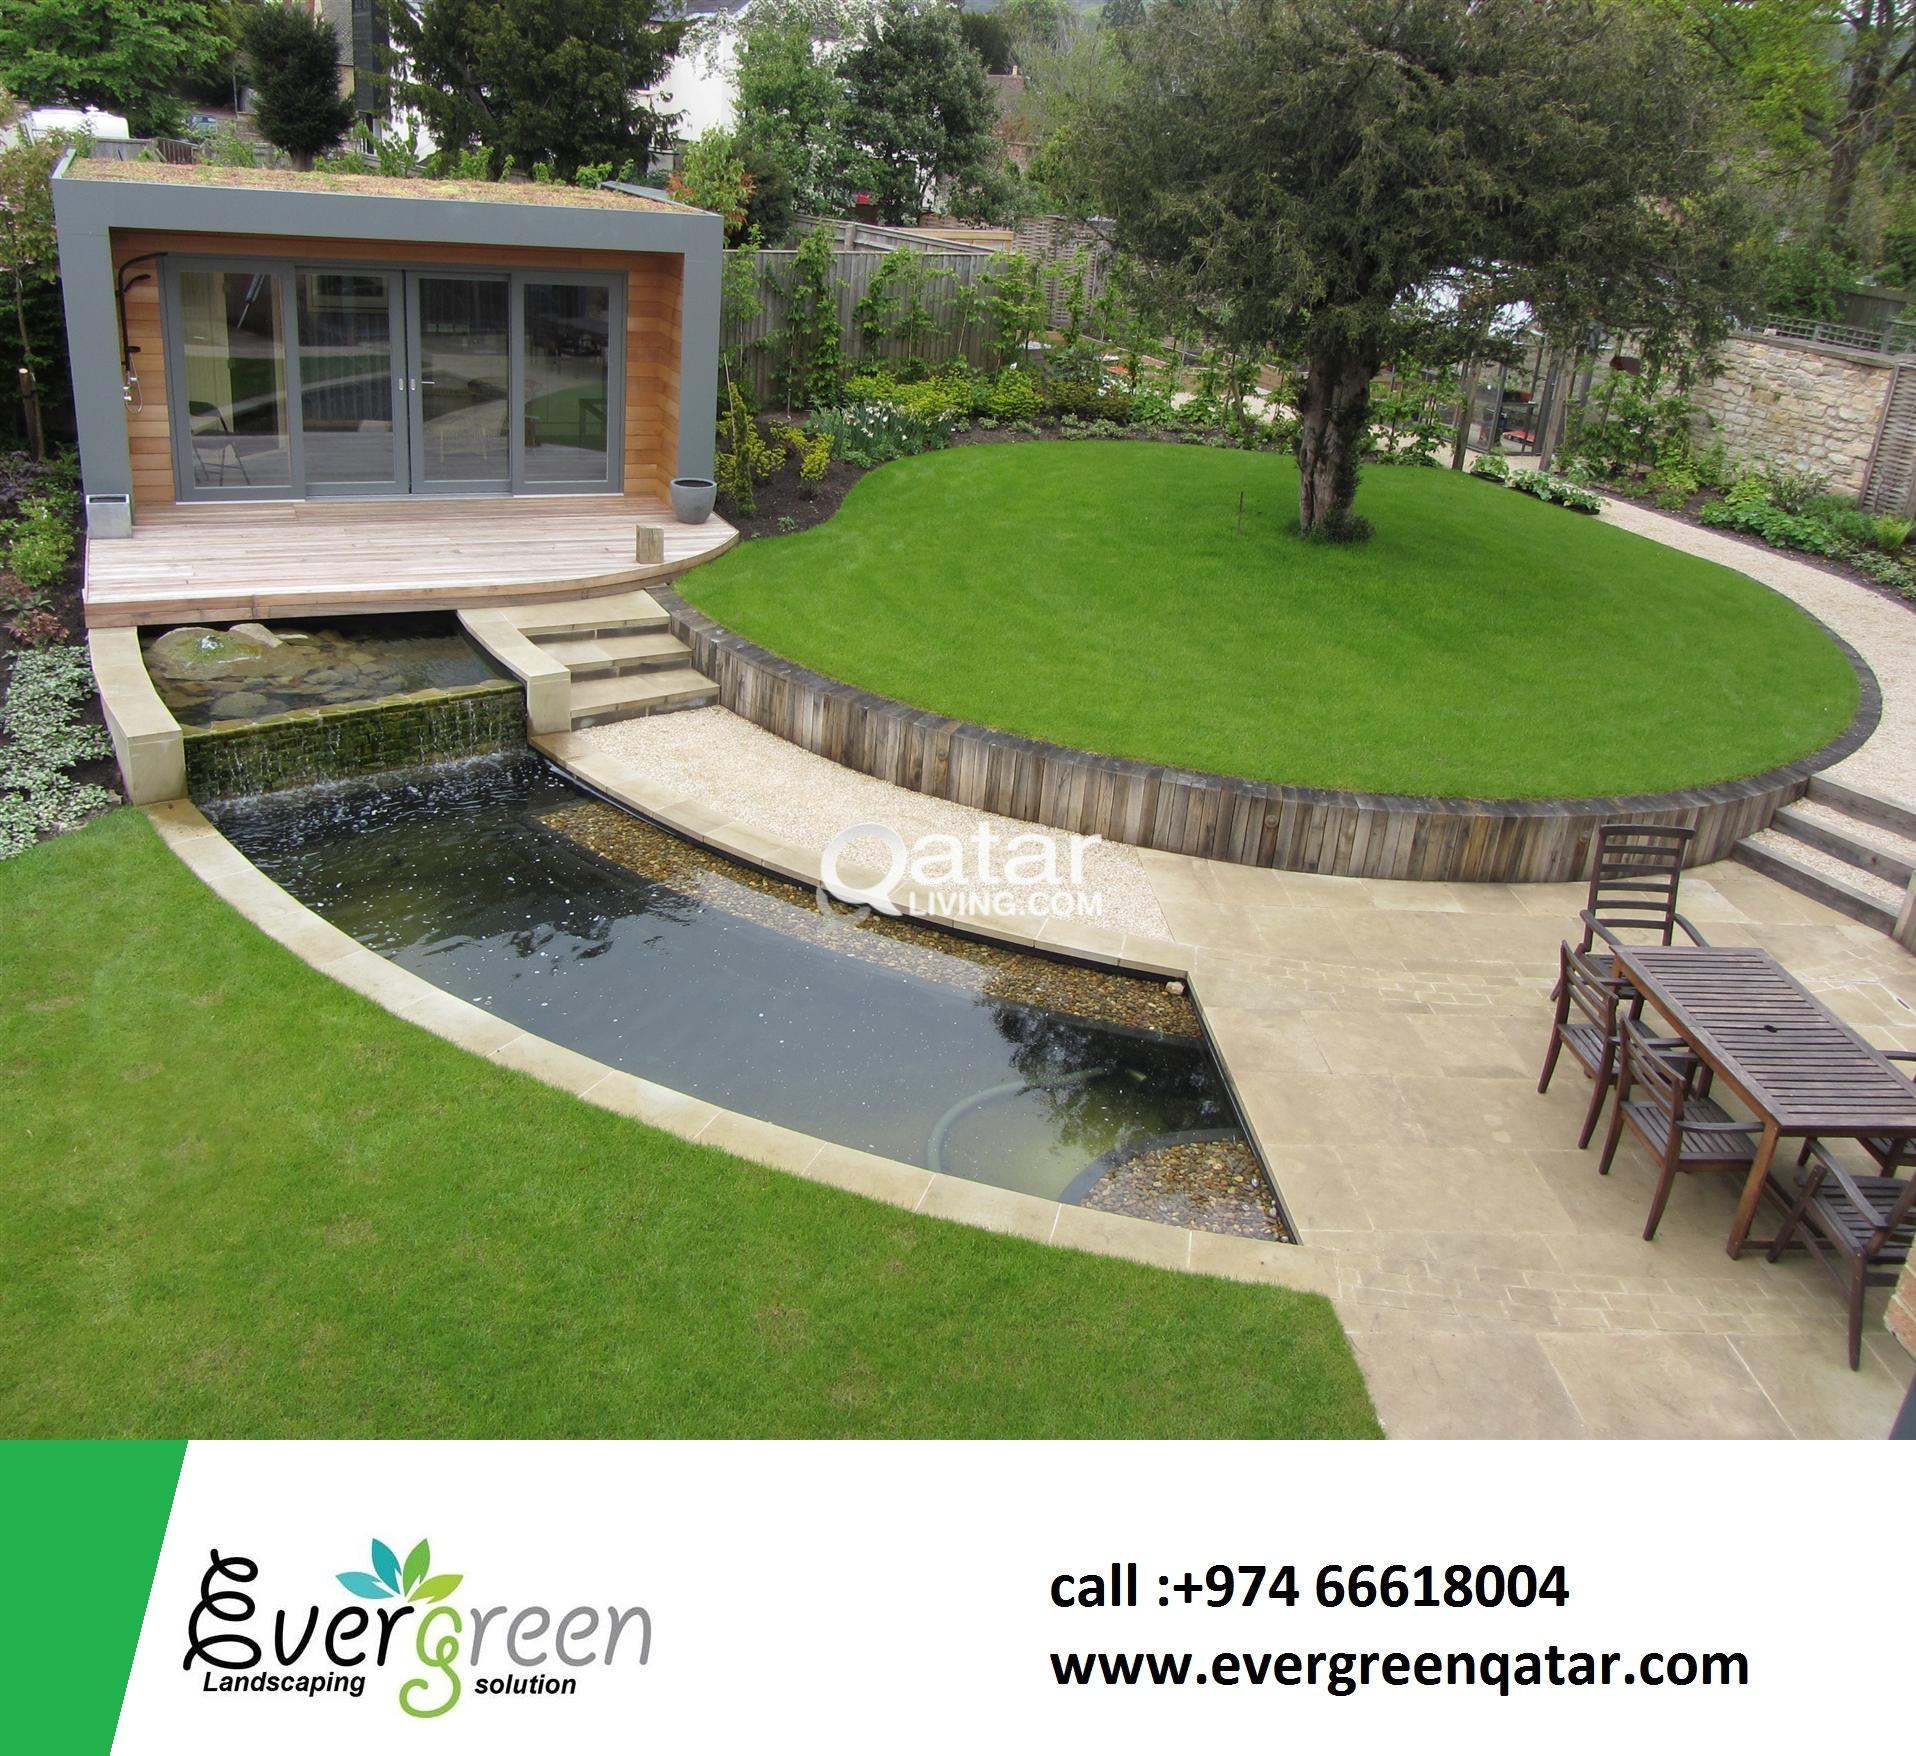 evergreen landscaping solution qatar qatar living